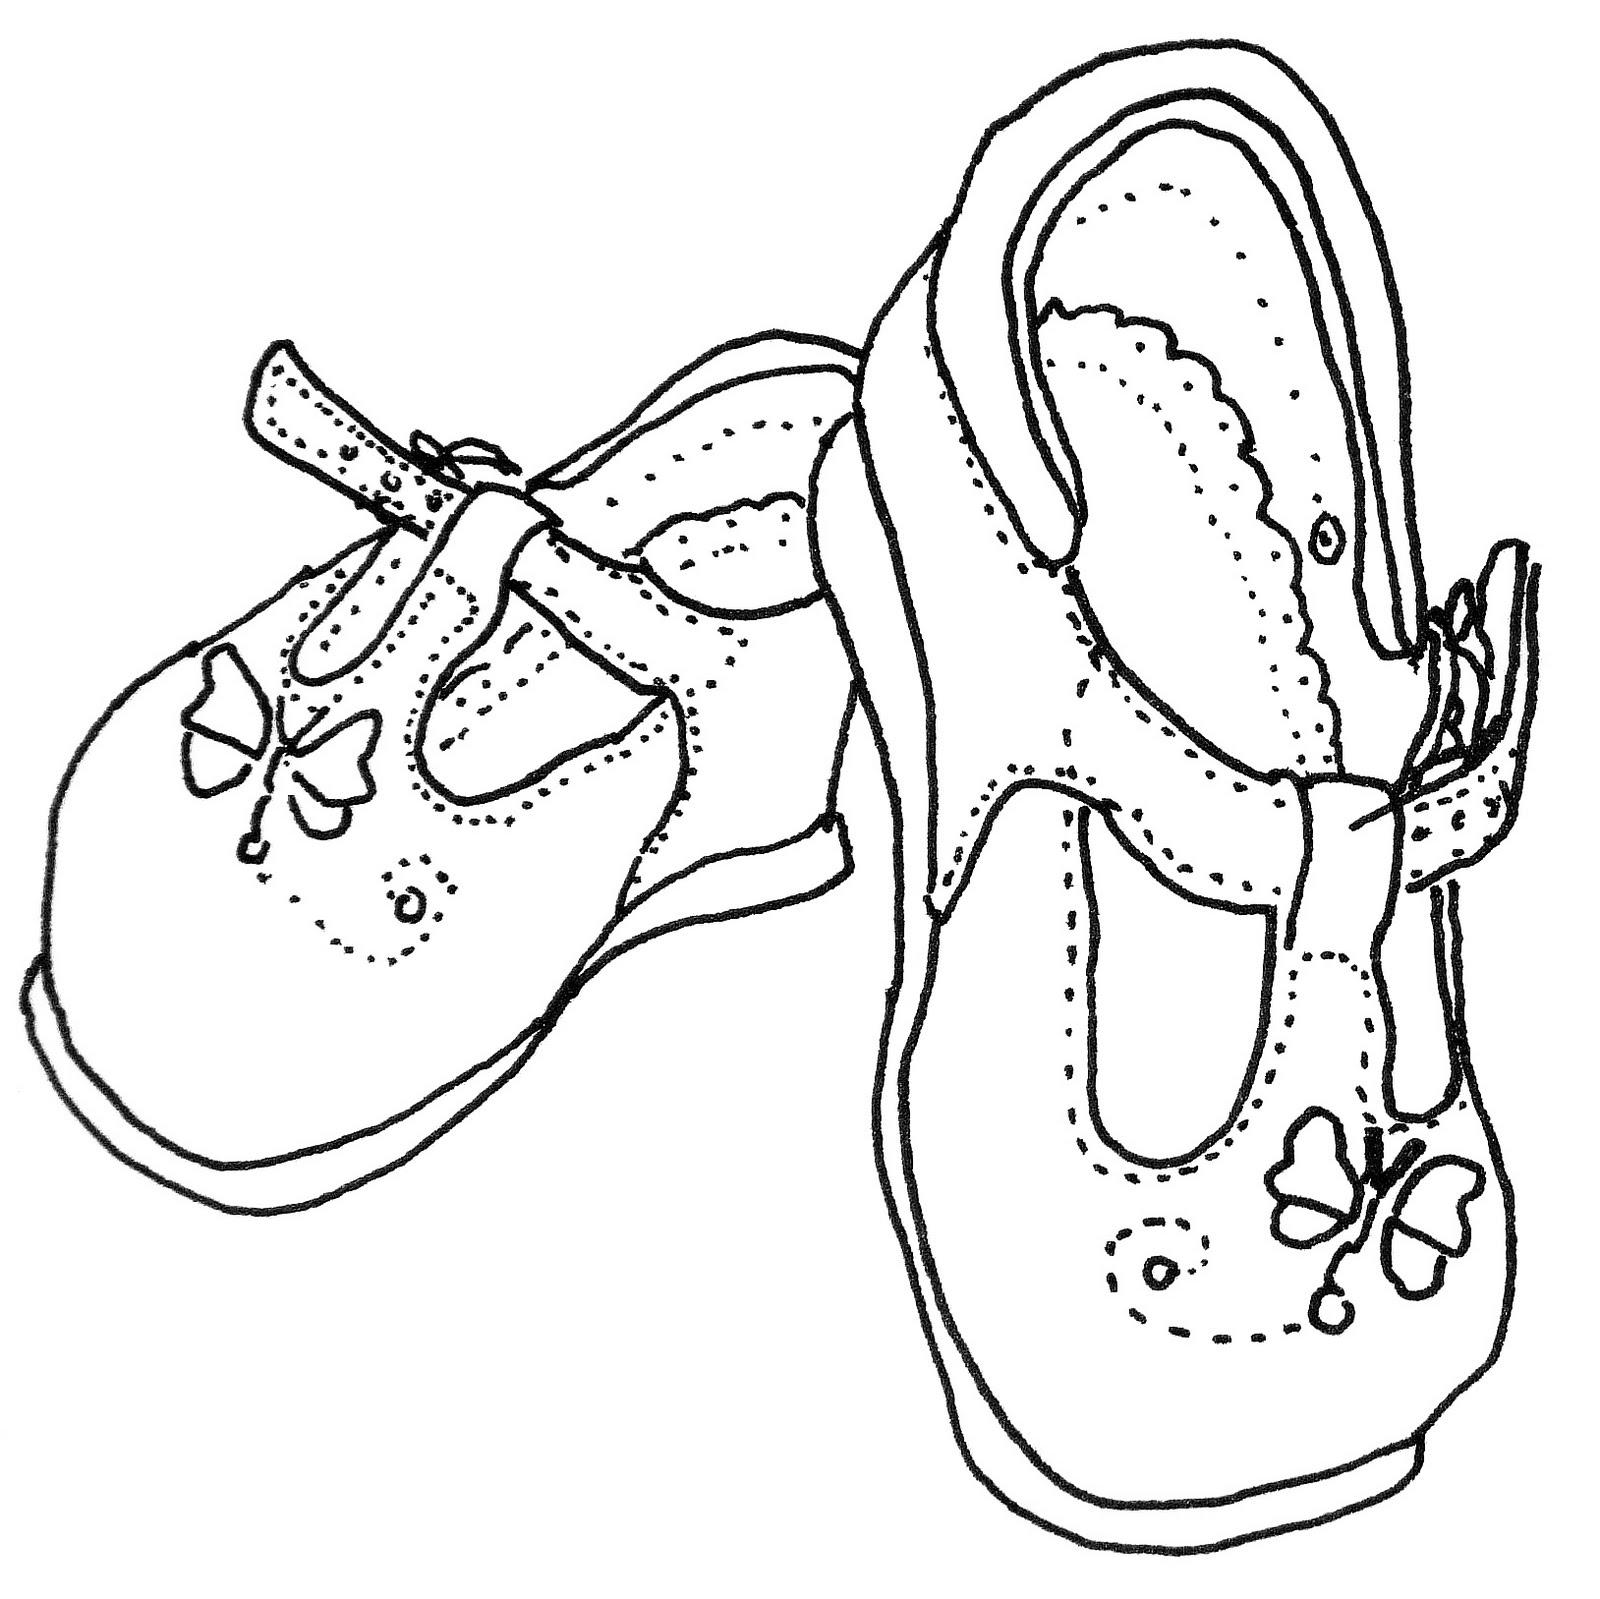 1600x1599 Dan's Drawing